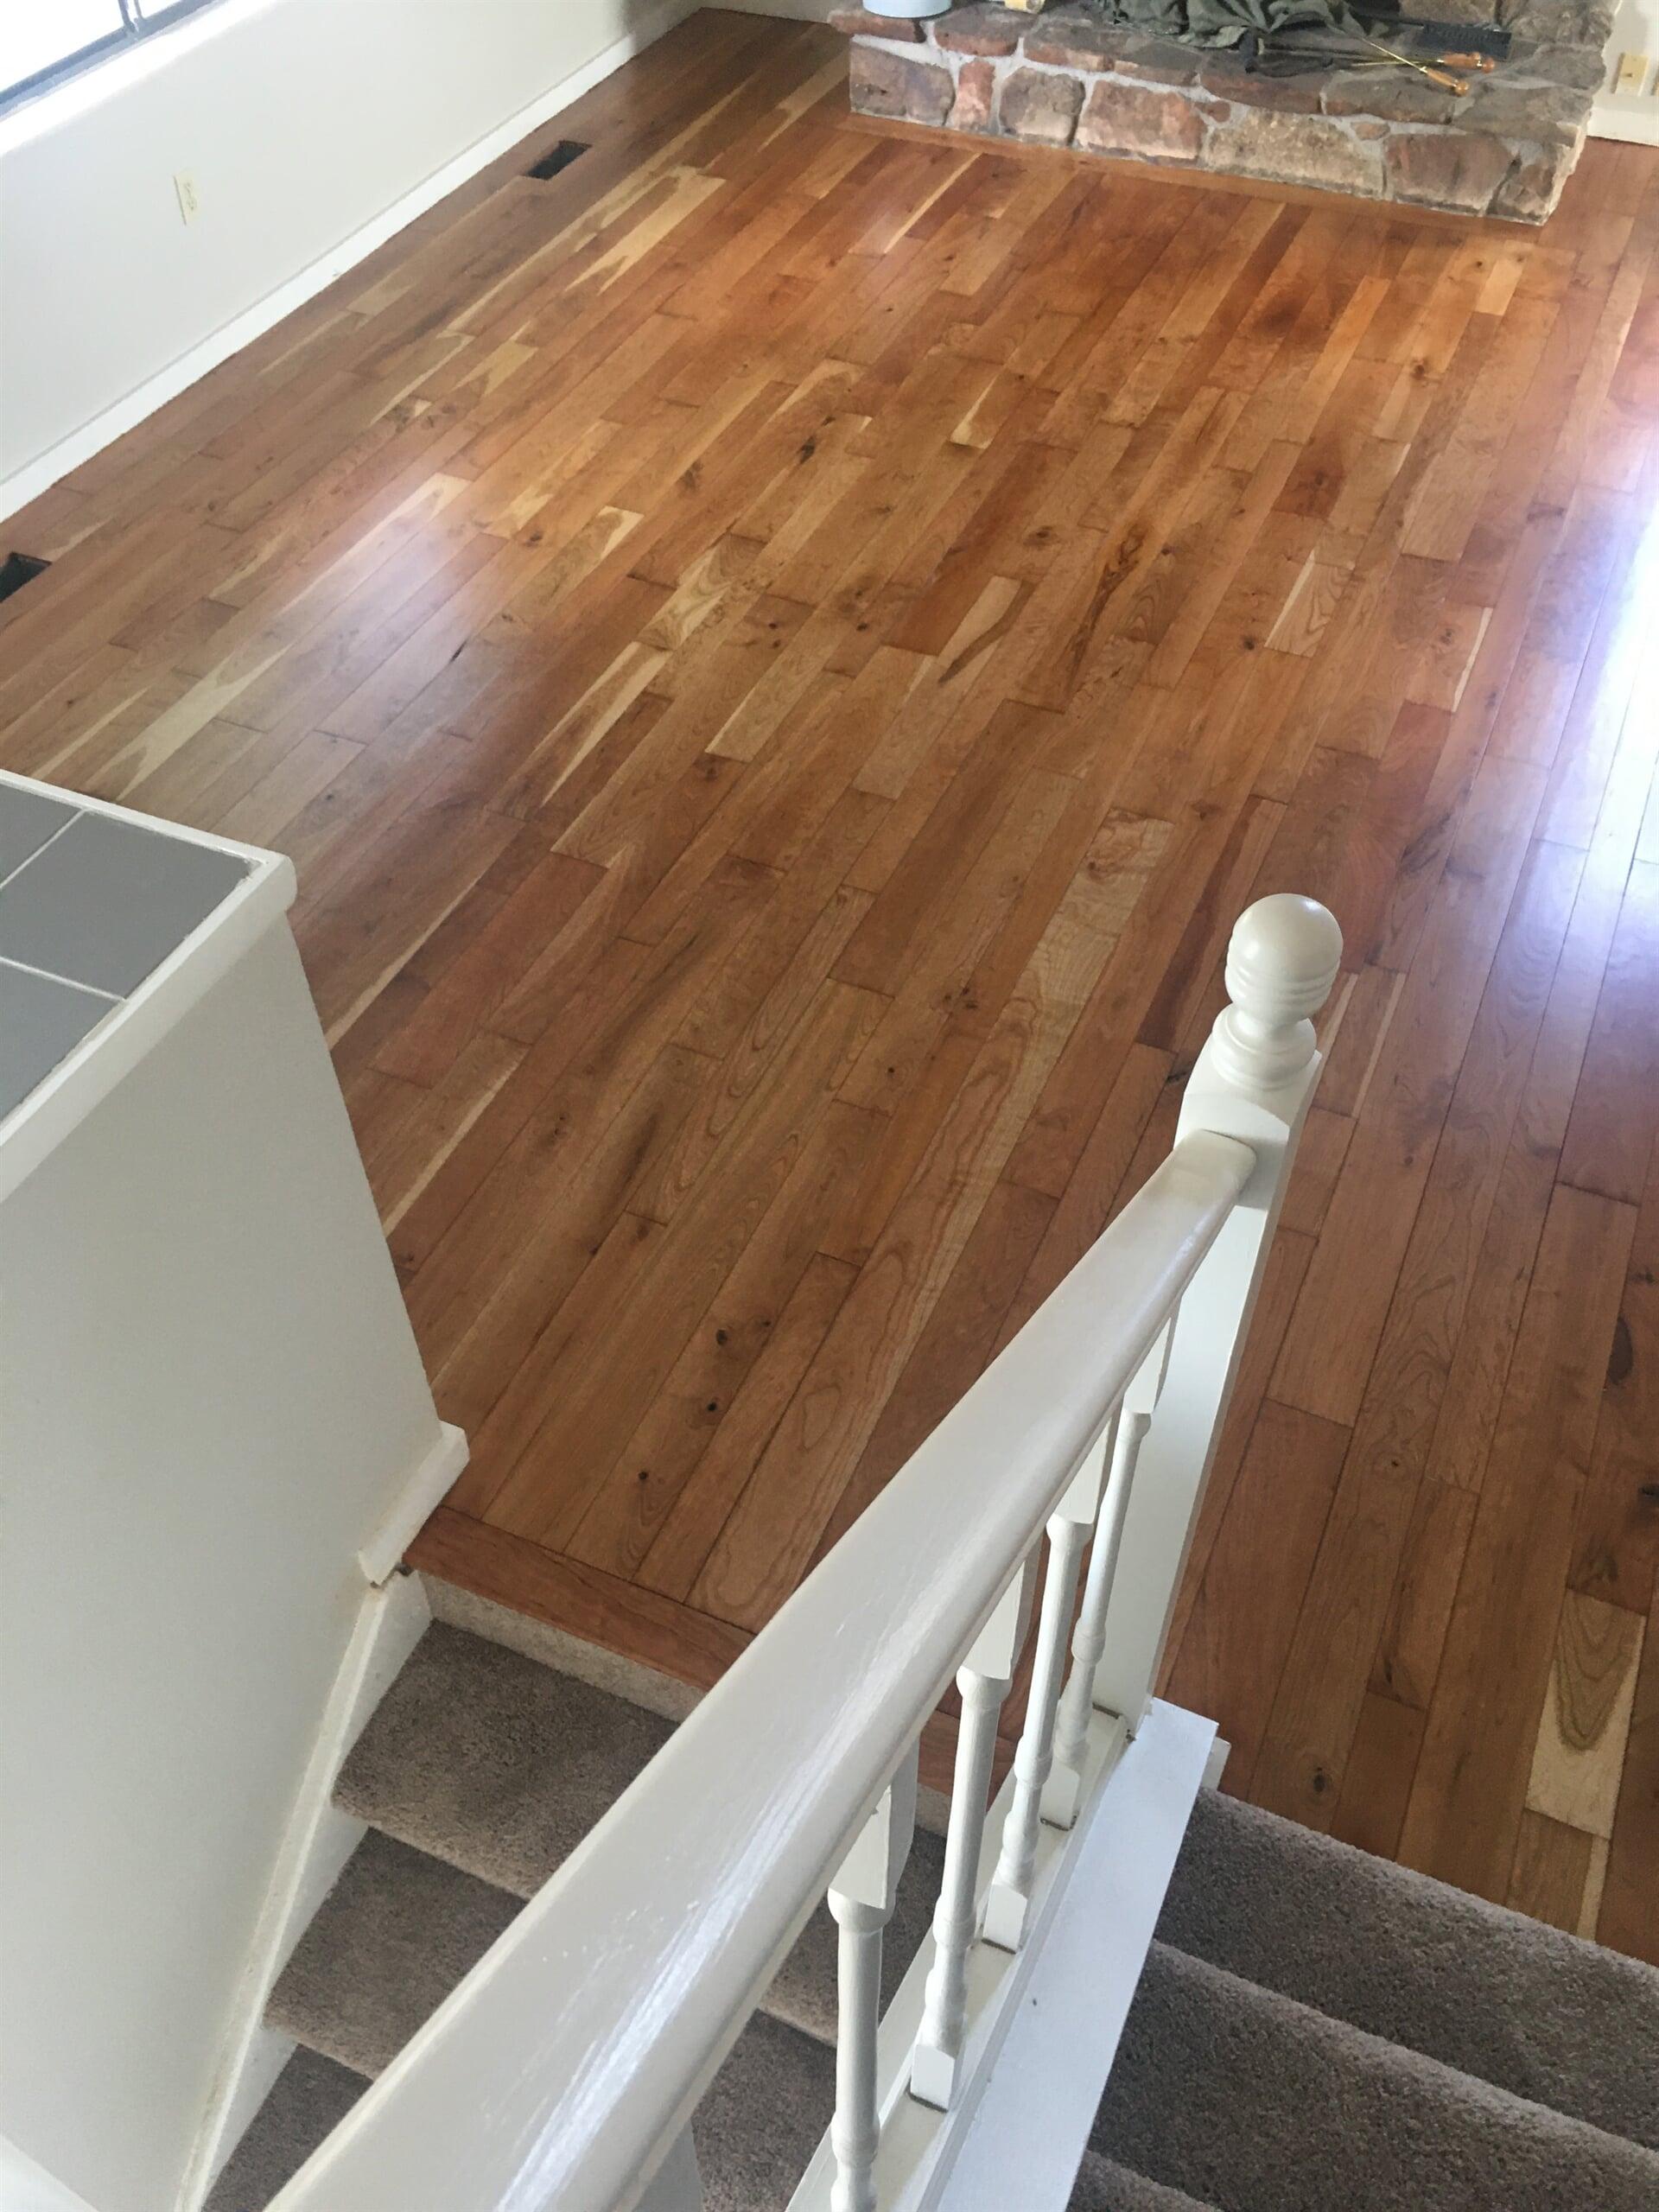 Wood flooring in Denver, CO from FH Flooring